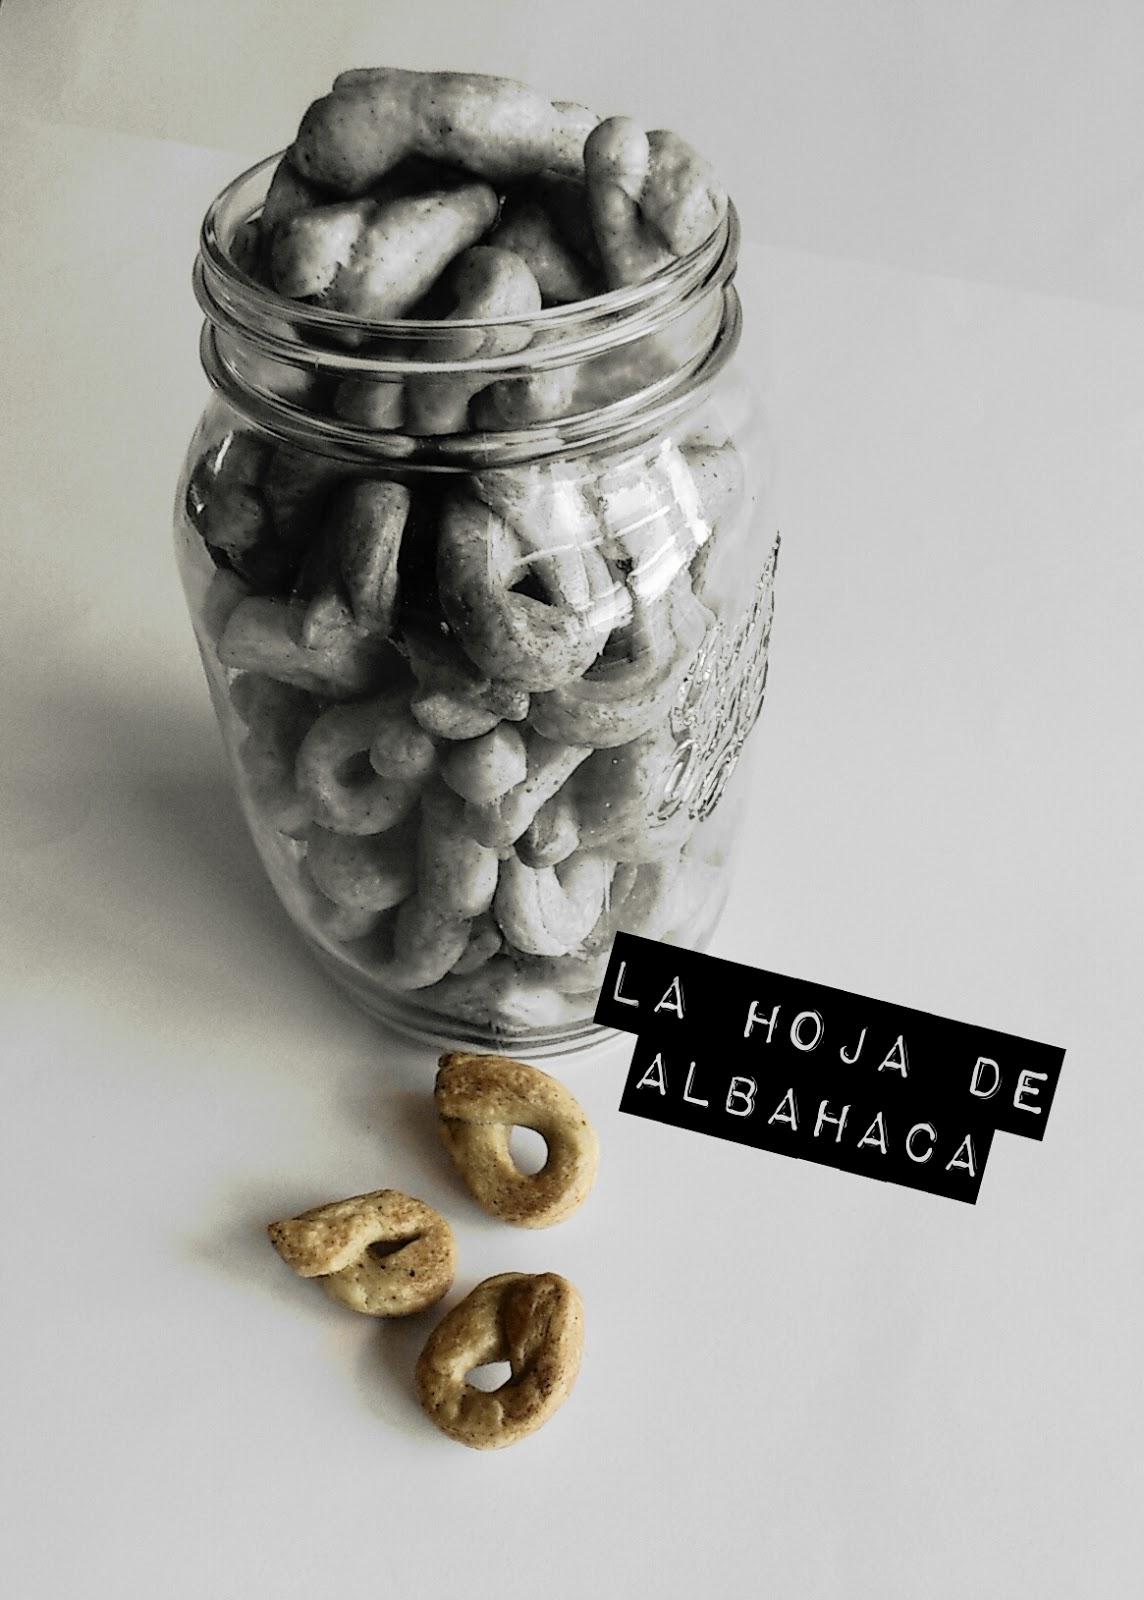 taralli, harina ecológica, harina molida a piedra, Apulia, Mulino Marino, La tiedna de la hoja, Italia, pimienta negra